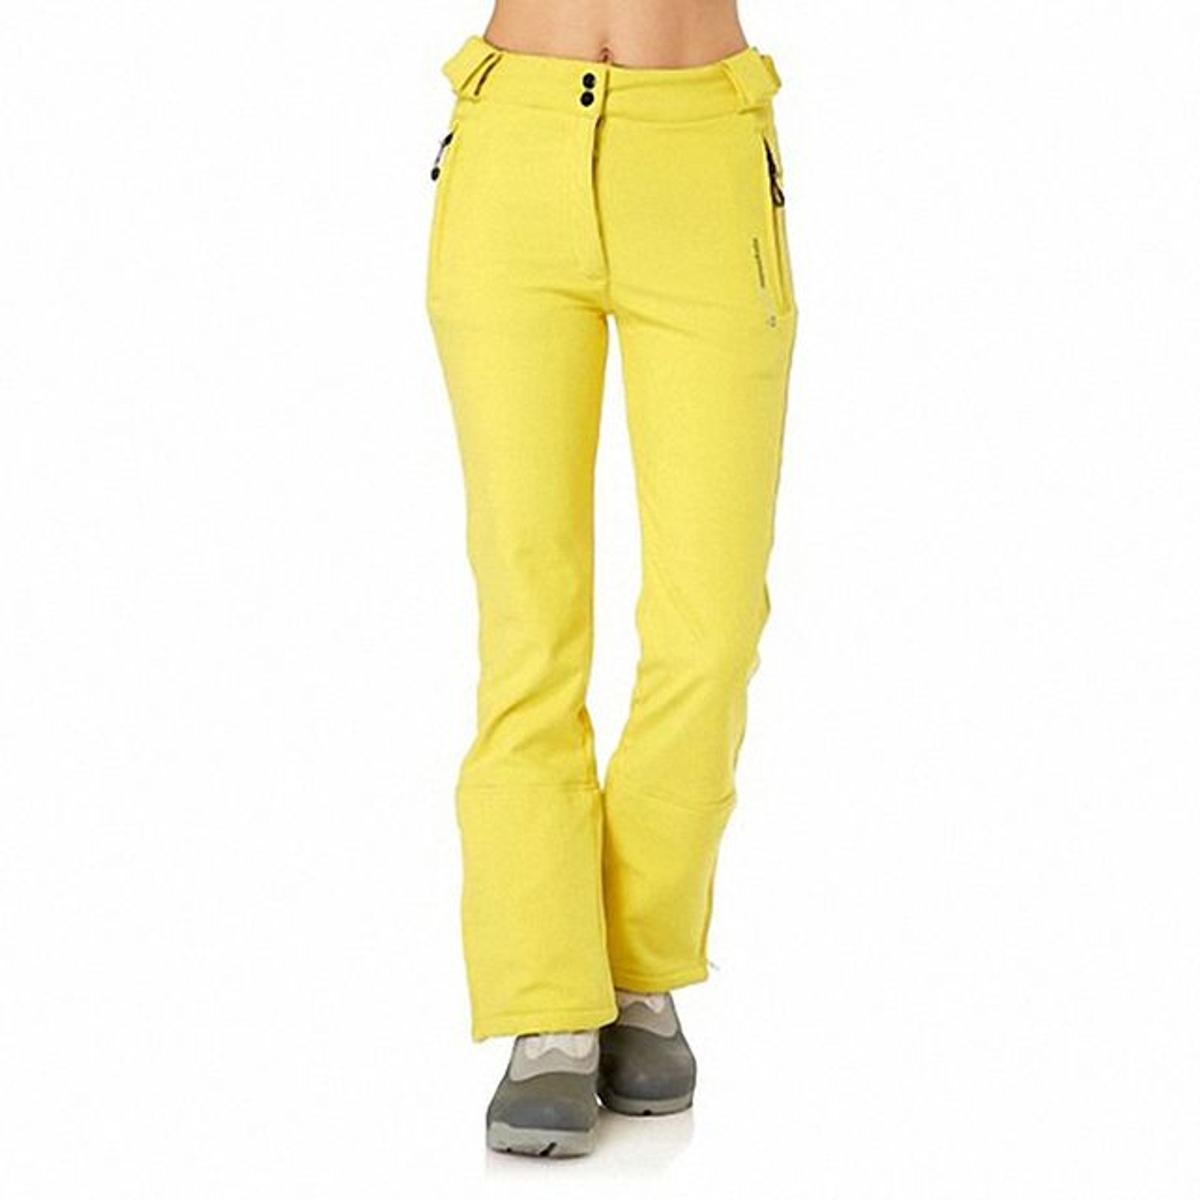 Peak Mountain - Pantalon de ski 10/16 ans GASHELL-jaune